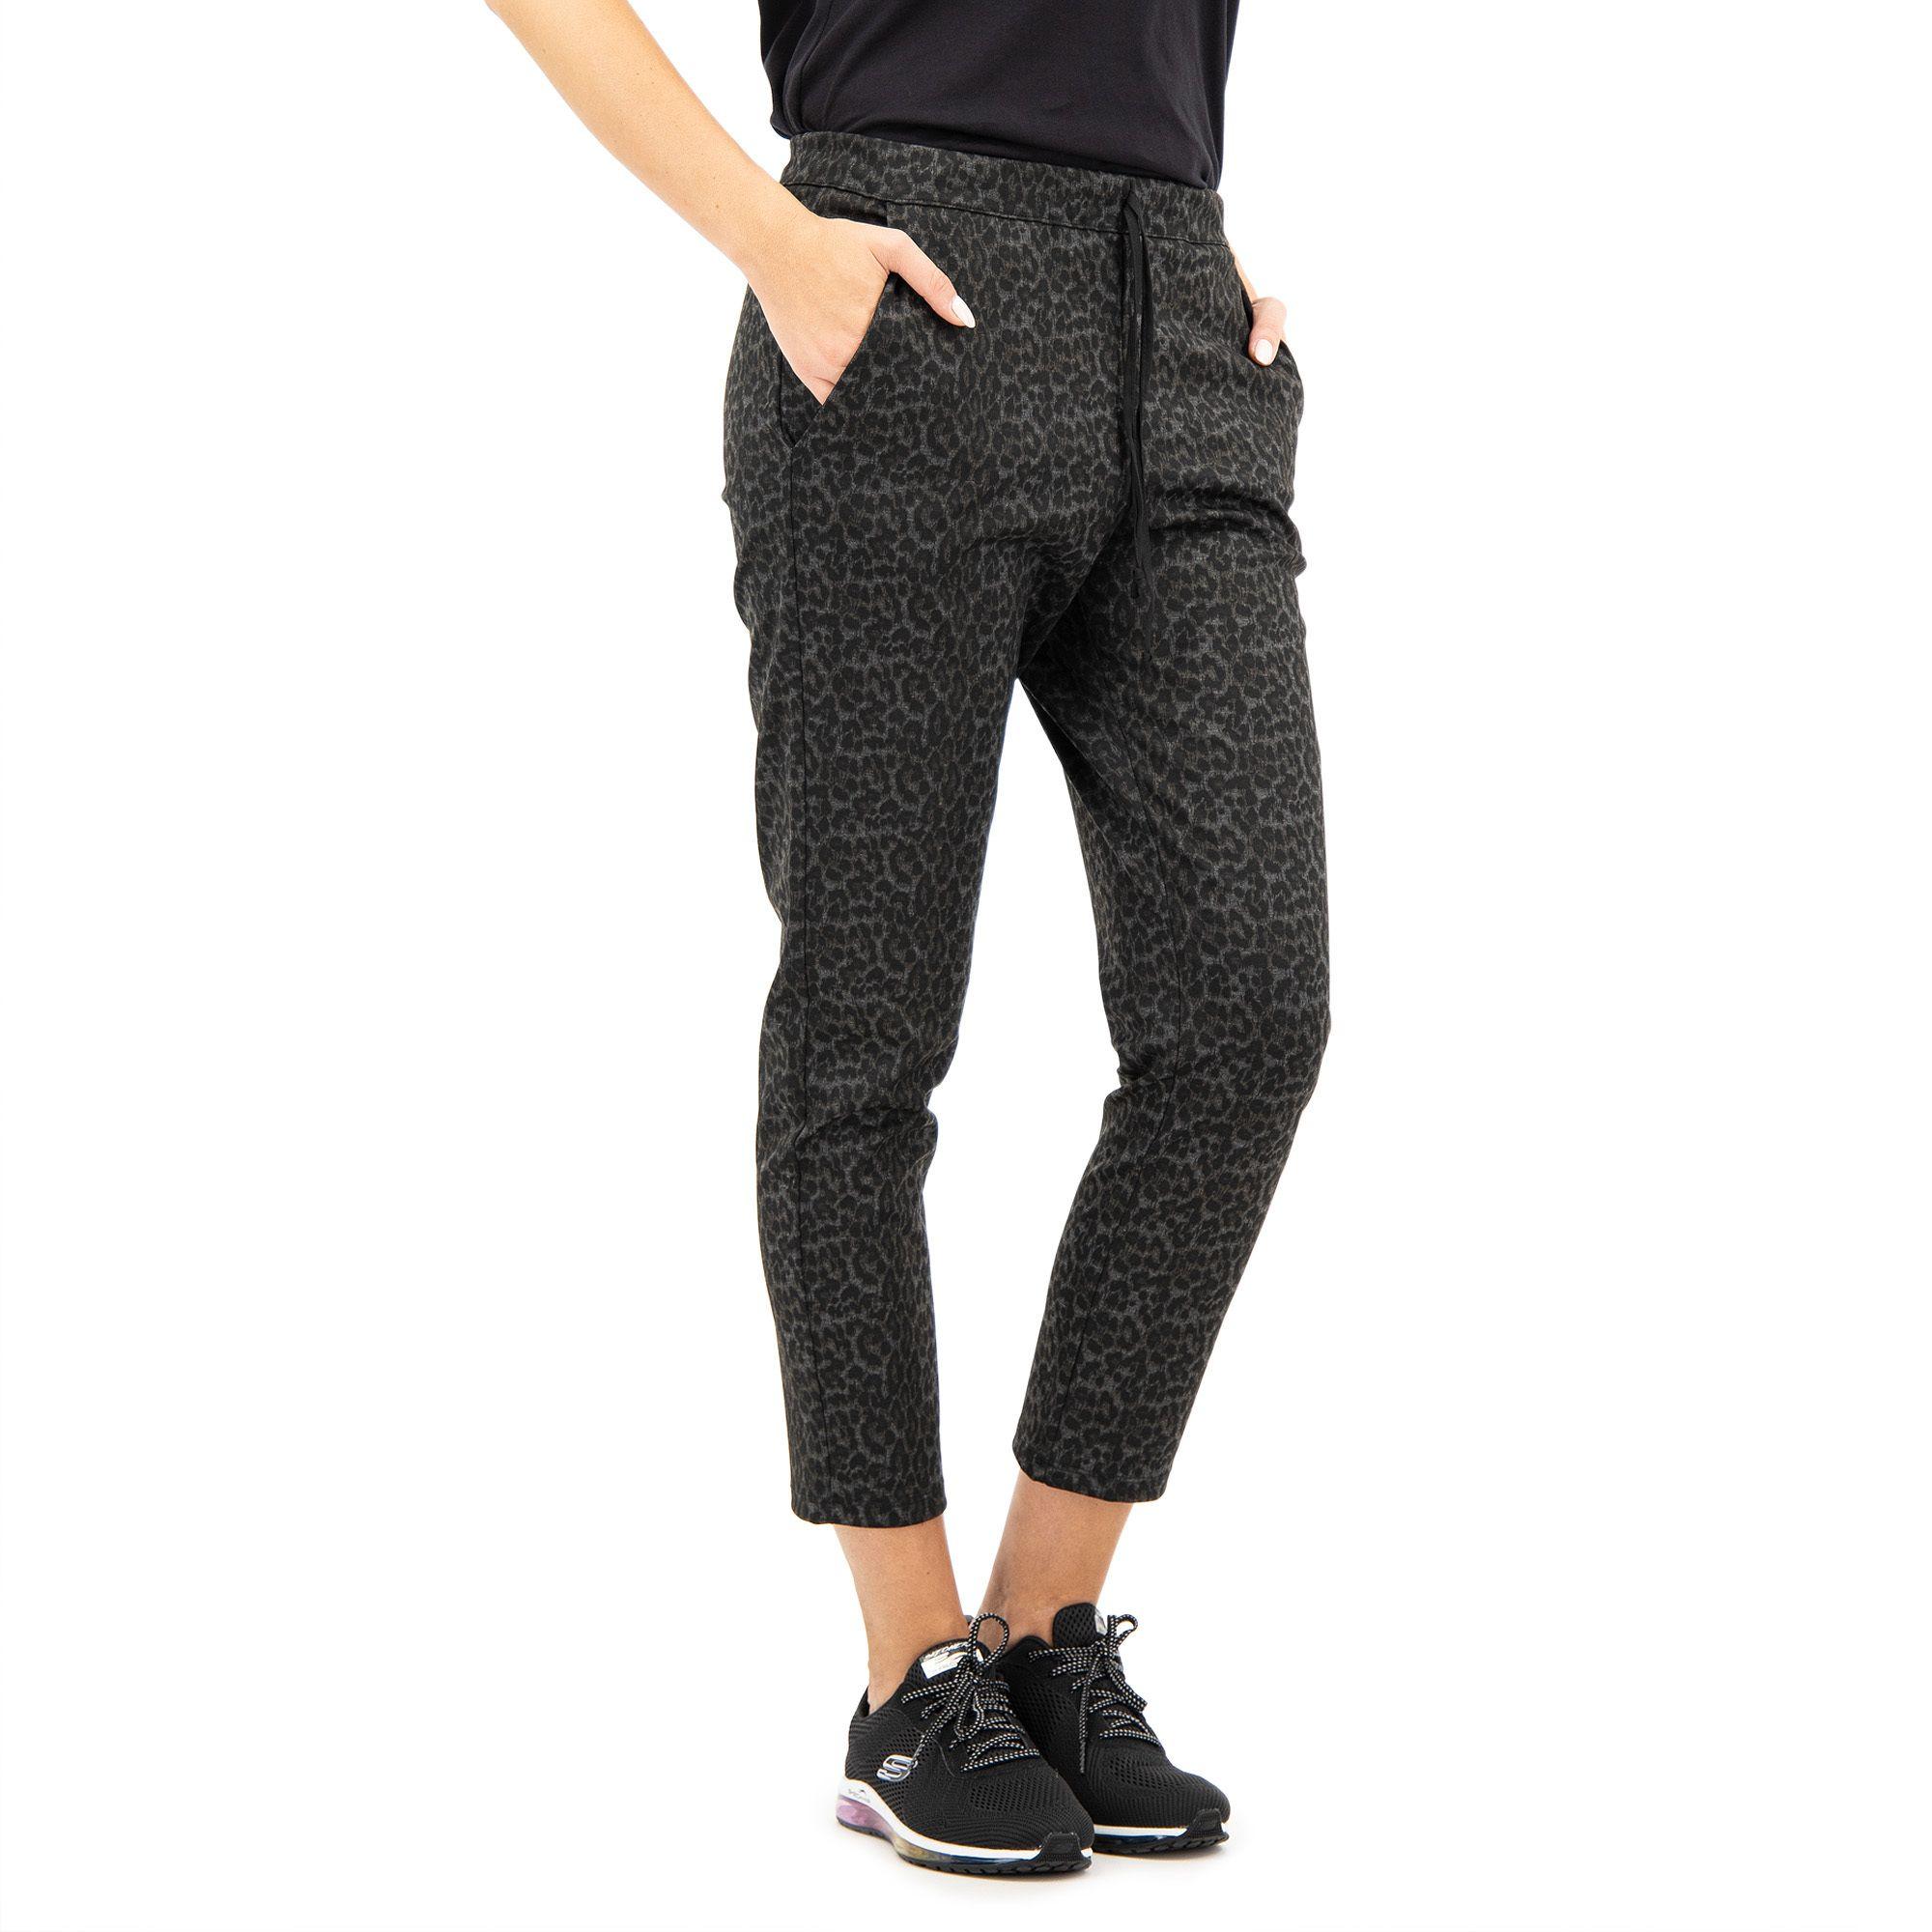 Image of Pantalone jogger in punto milano maculato